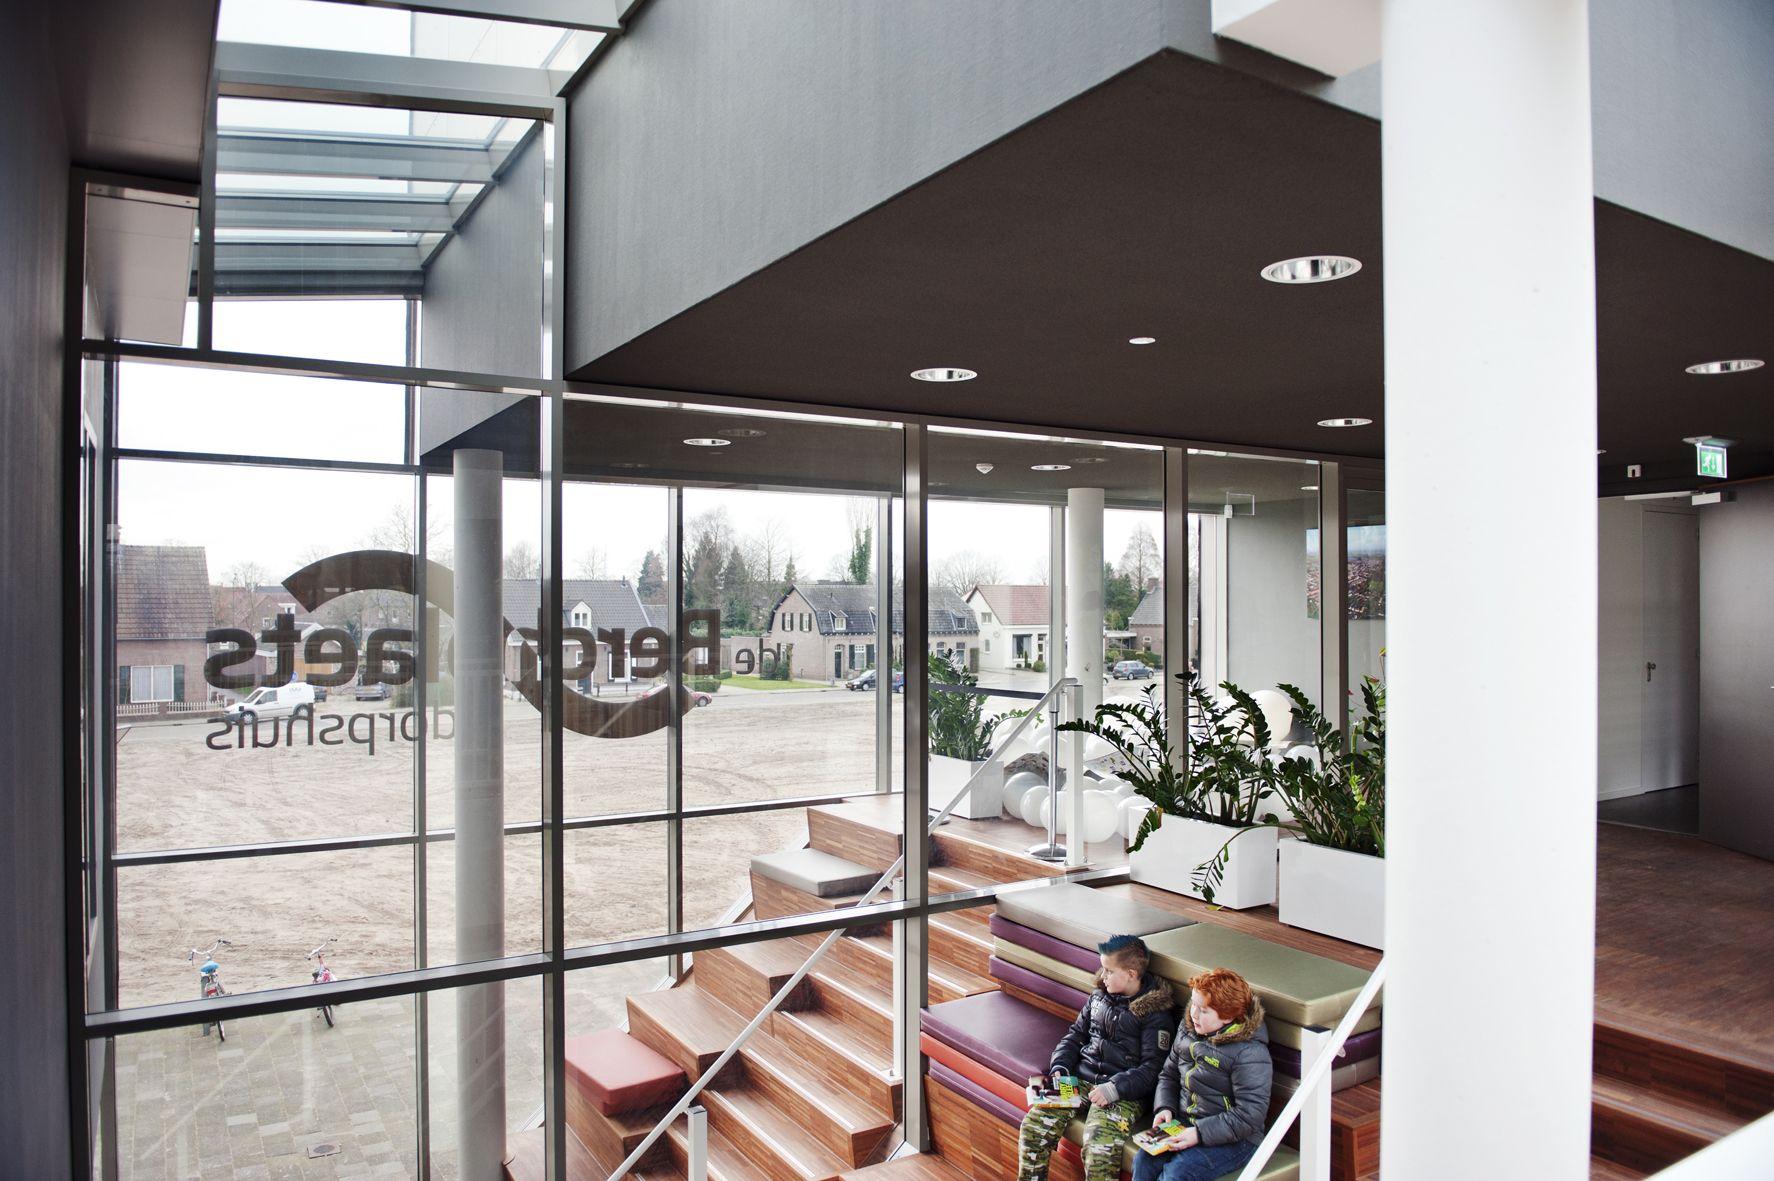 Dorpscentrum De Berchplaets Te Berghem Fotografie Madeleine Sars Architecten